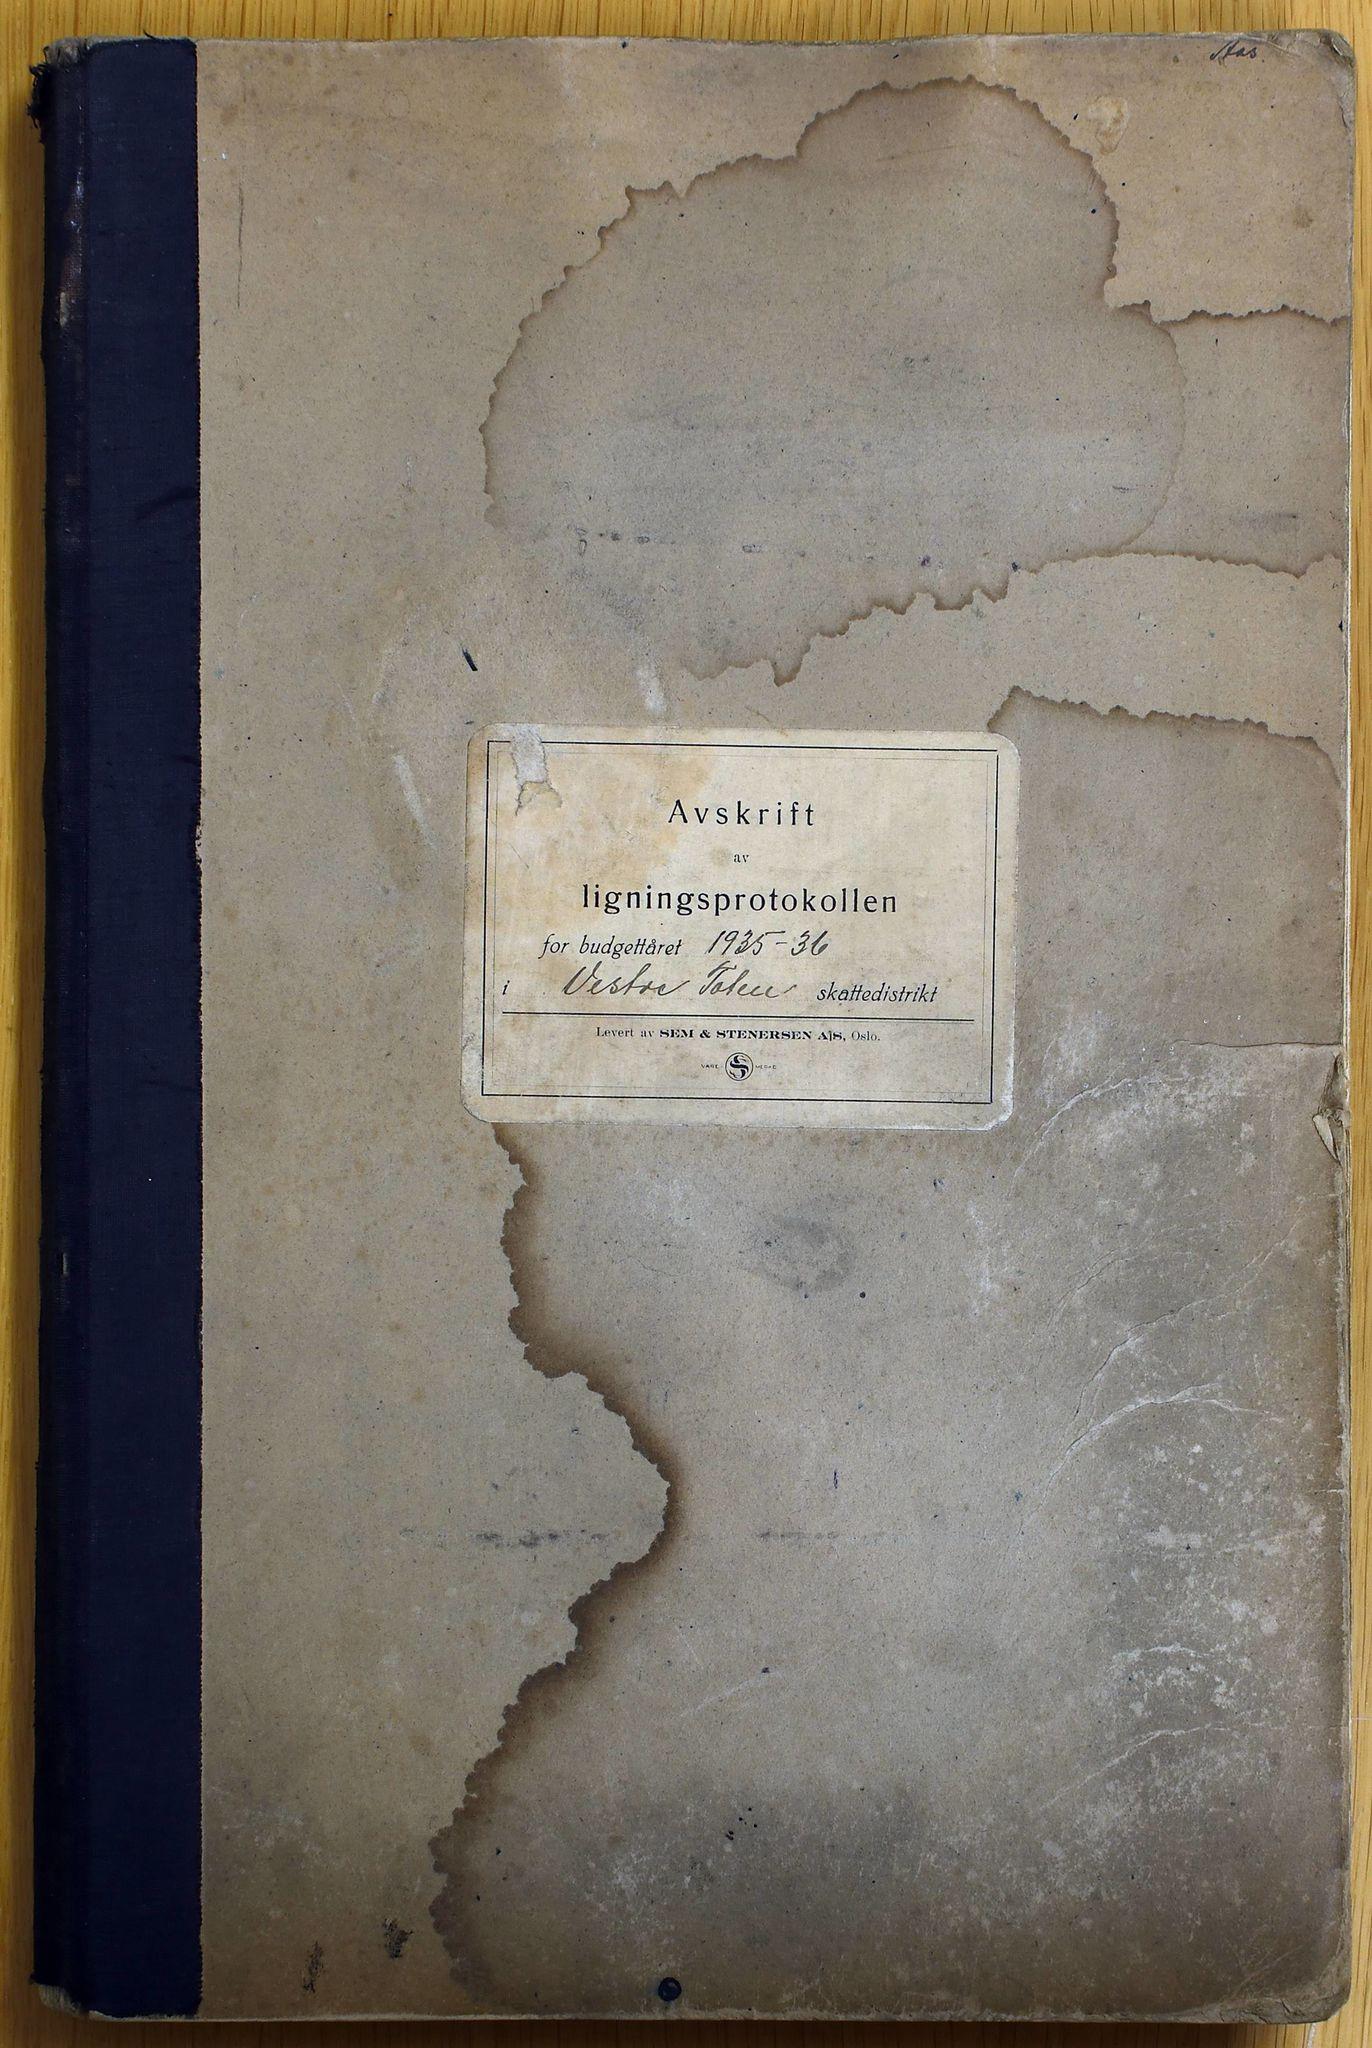 KVT, Vestre Toten municipality archive – Vestre Toten, Tax assessment protocol 1935-1936, 1935-1936